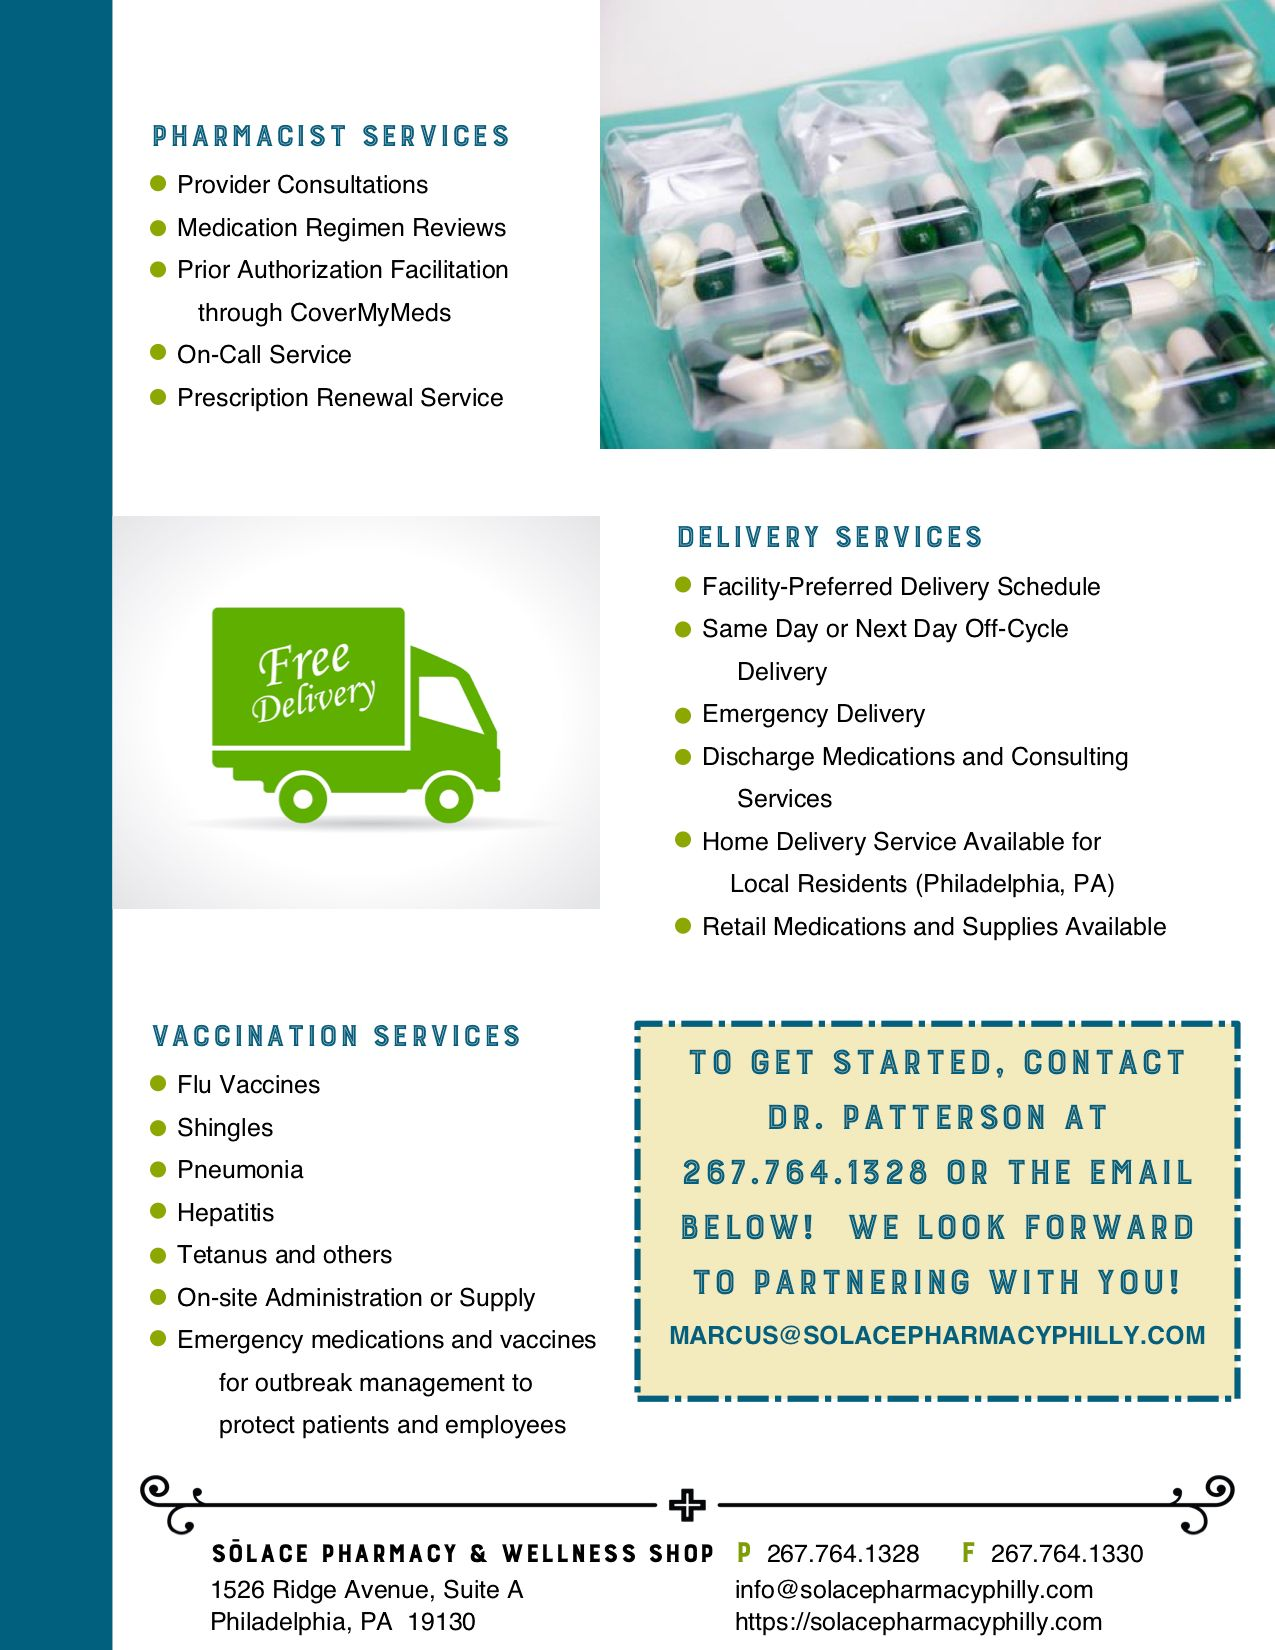 Solace_Pharmacy_ALFLTC_Services October 2020 3 .jpg